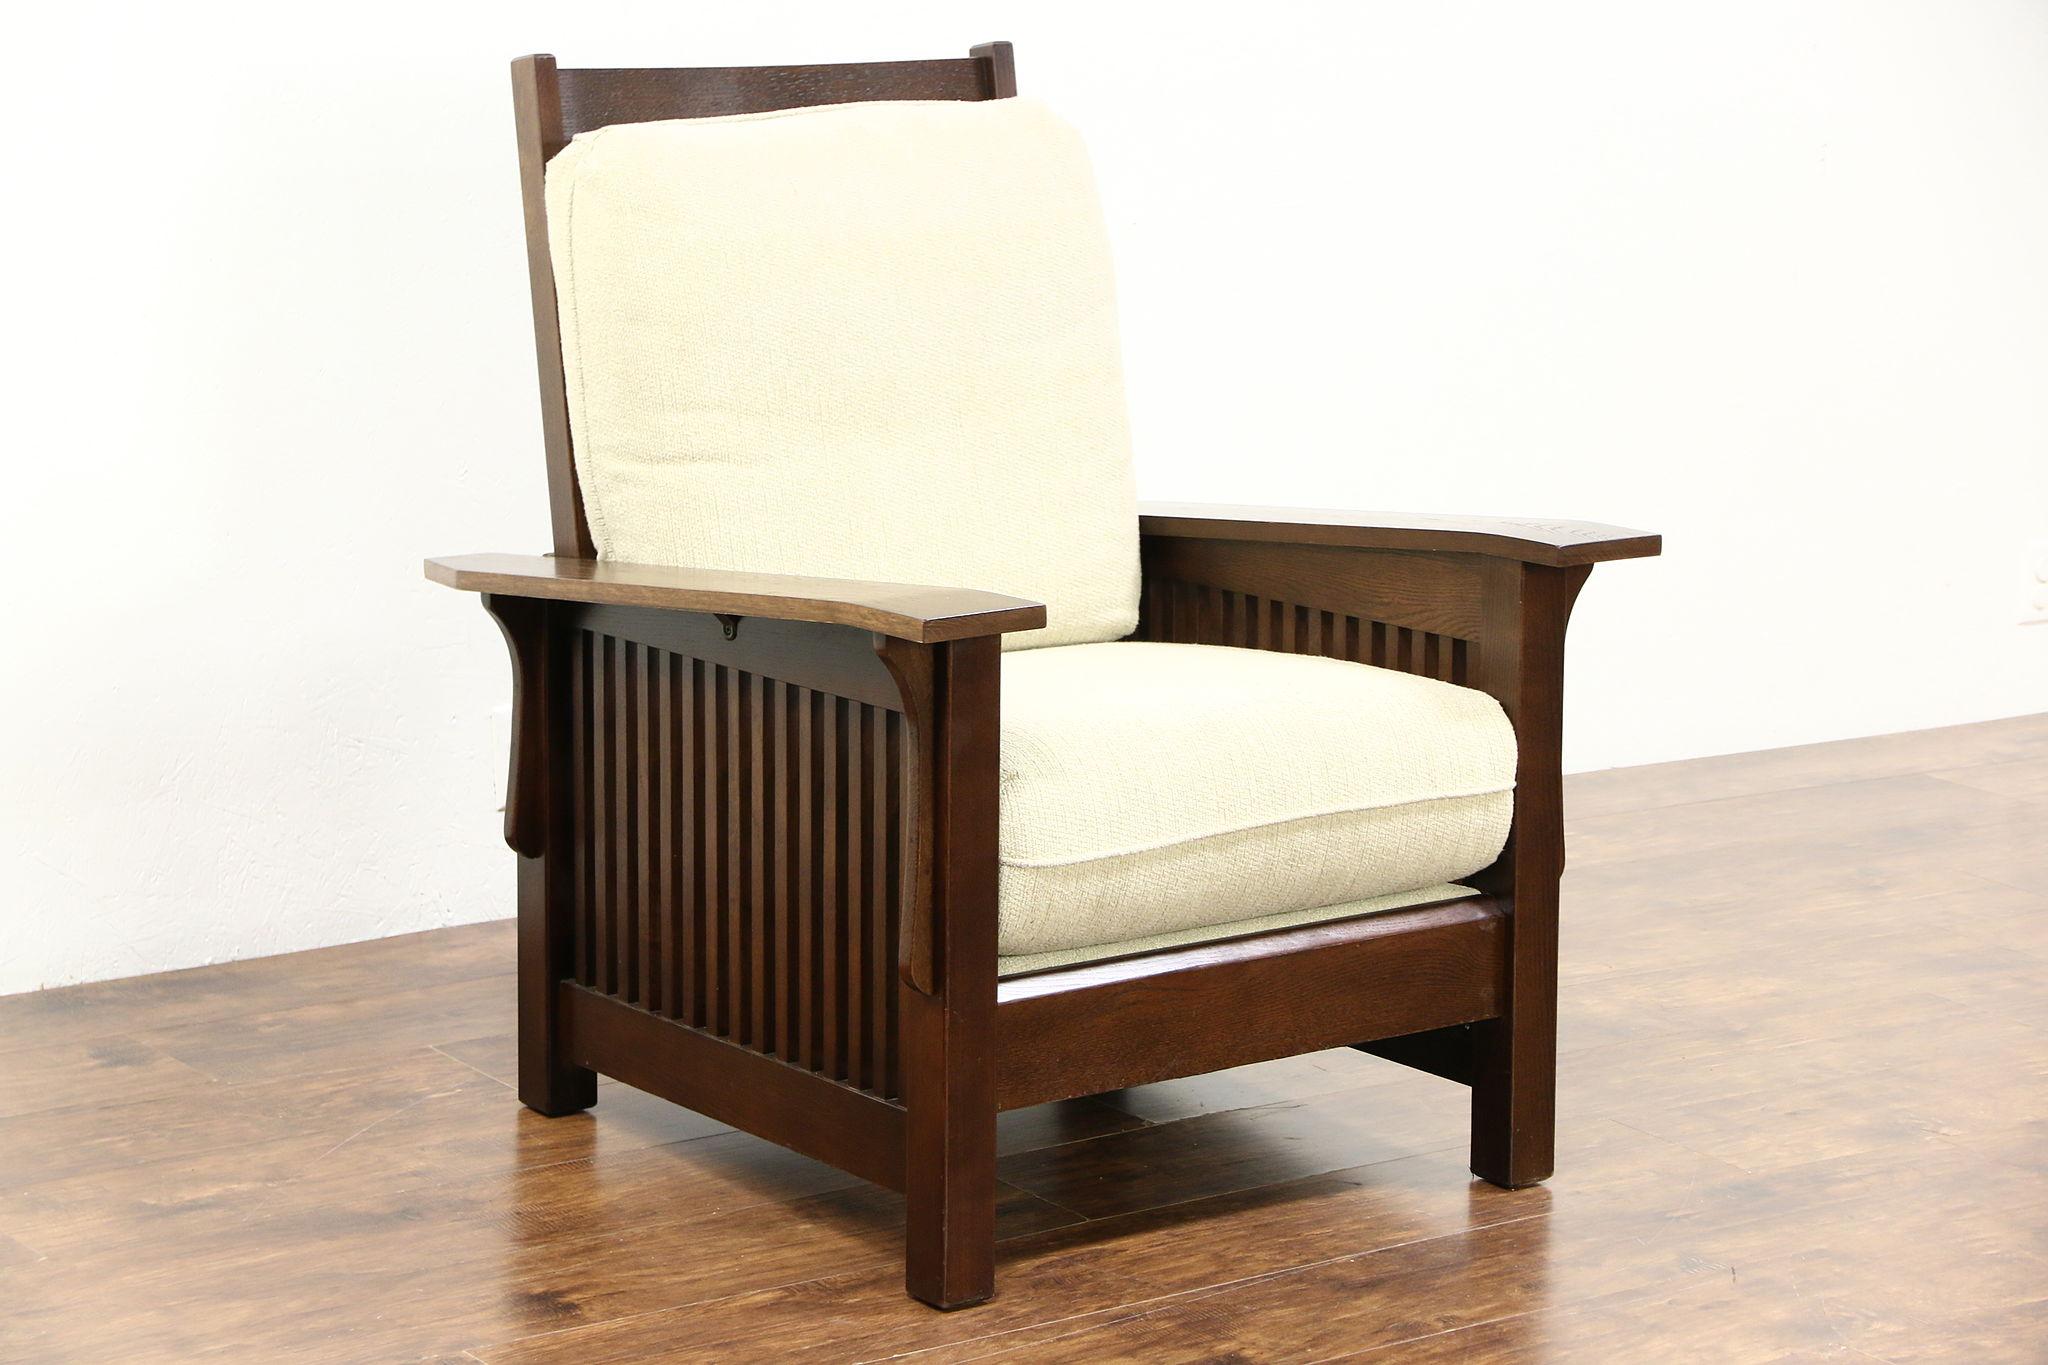 Amazing Arts Crafts Mission Oak Vintage Morris Craftsman Recliner Chair Bassett Unemploymentrelief Wooden Chair Designs For Living Room Unemploymentrelieforg